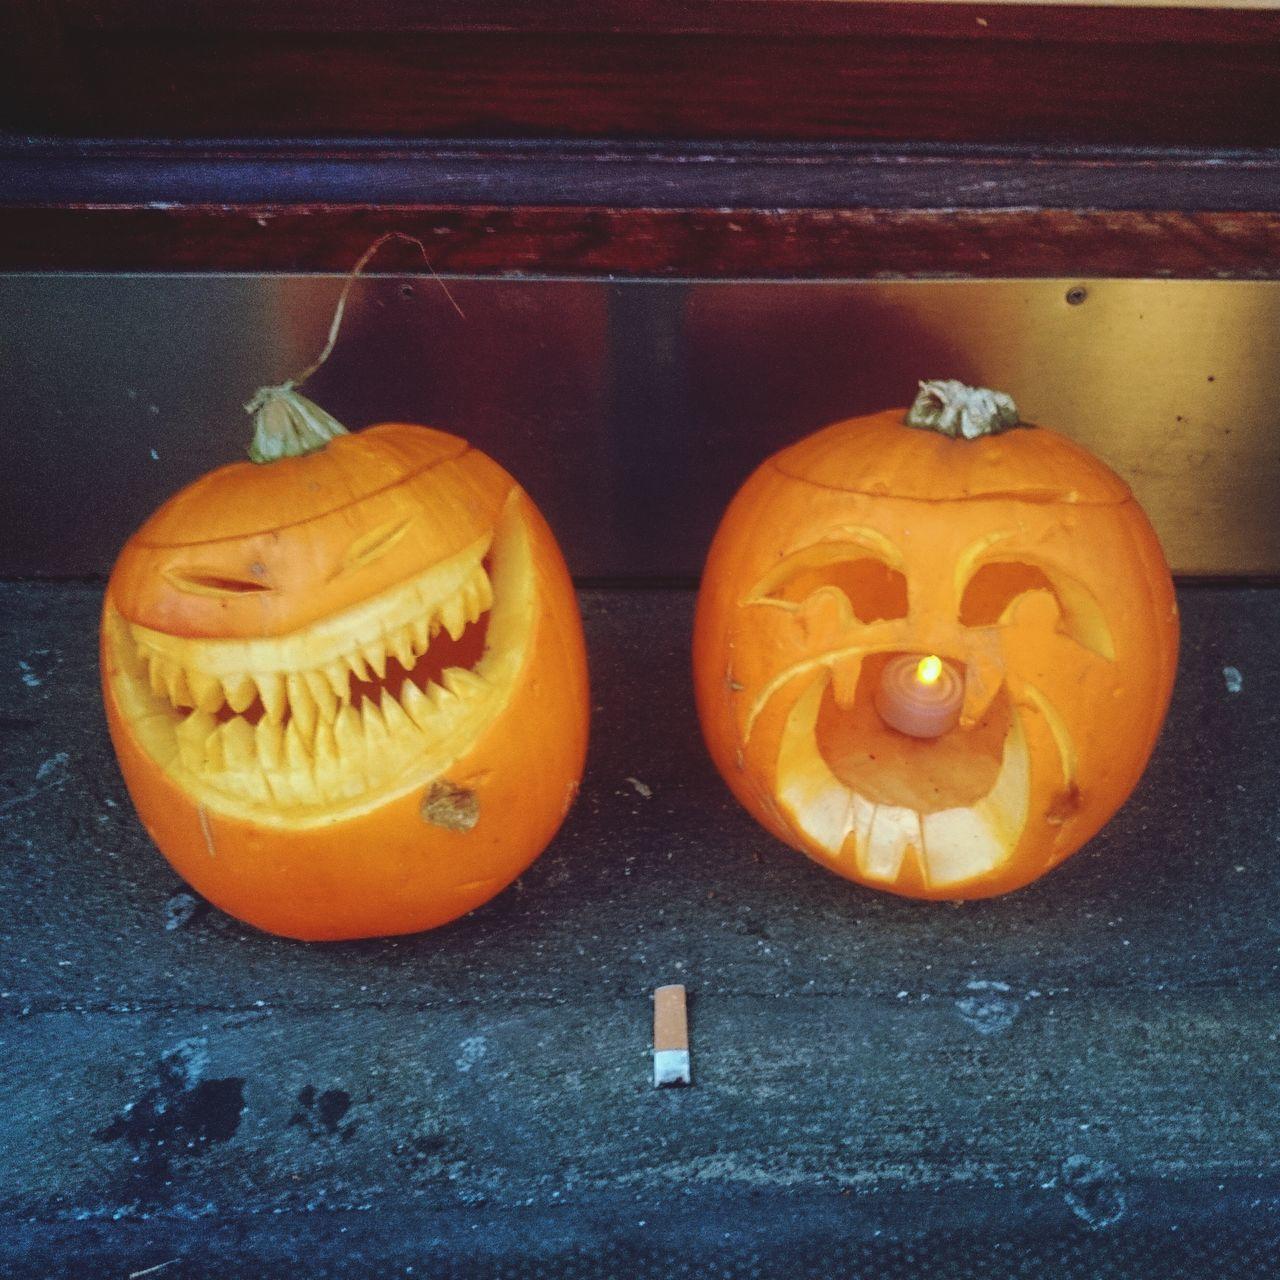 pumpkin, halloween, orange color, anthropomorphic face, jack o lantern, no people, celebration, food and drink, indoors, food, close-up, day